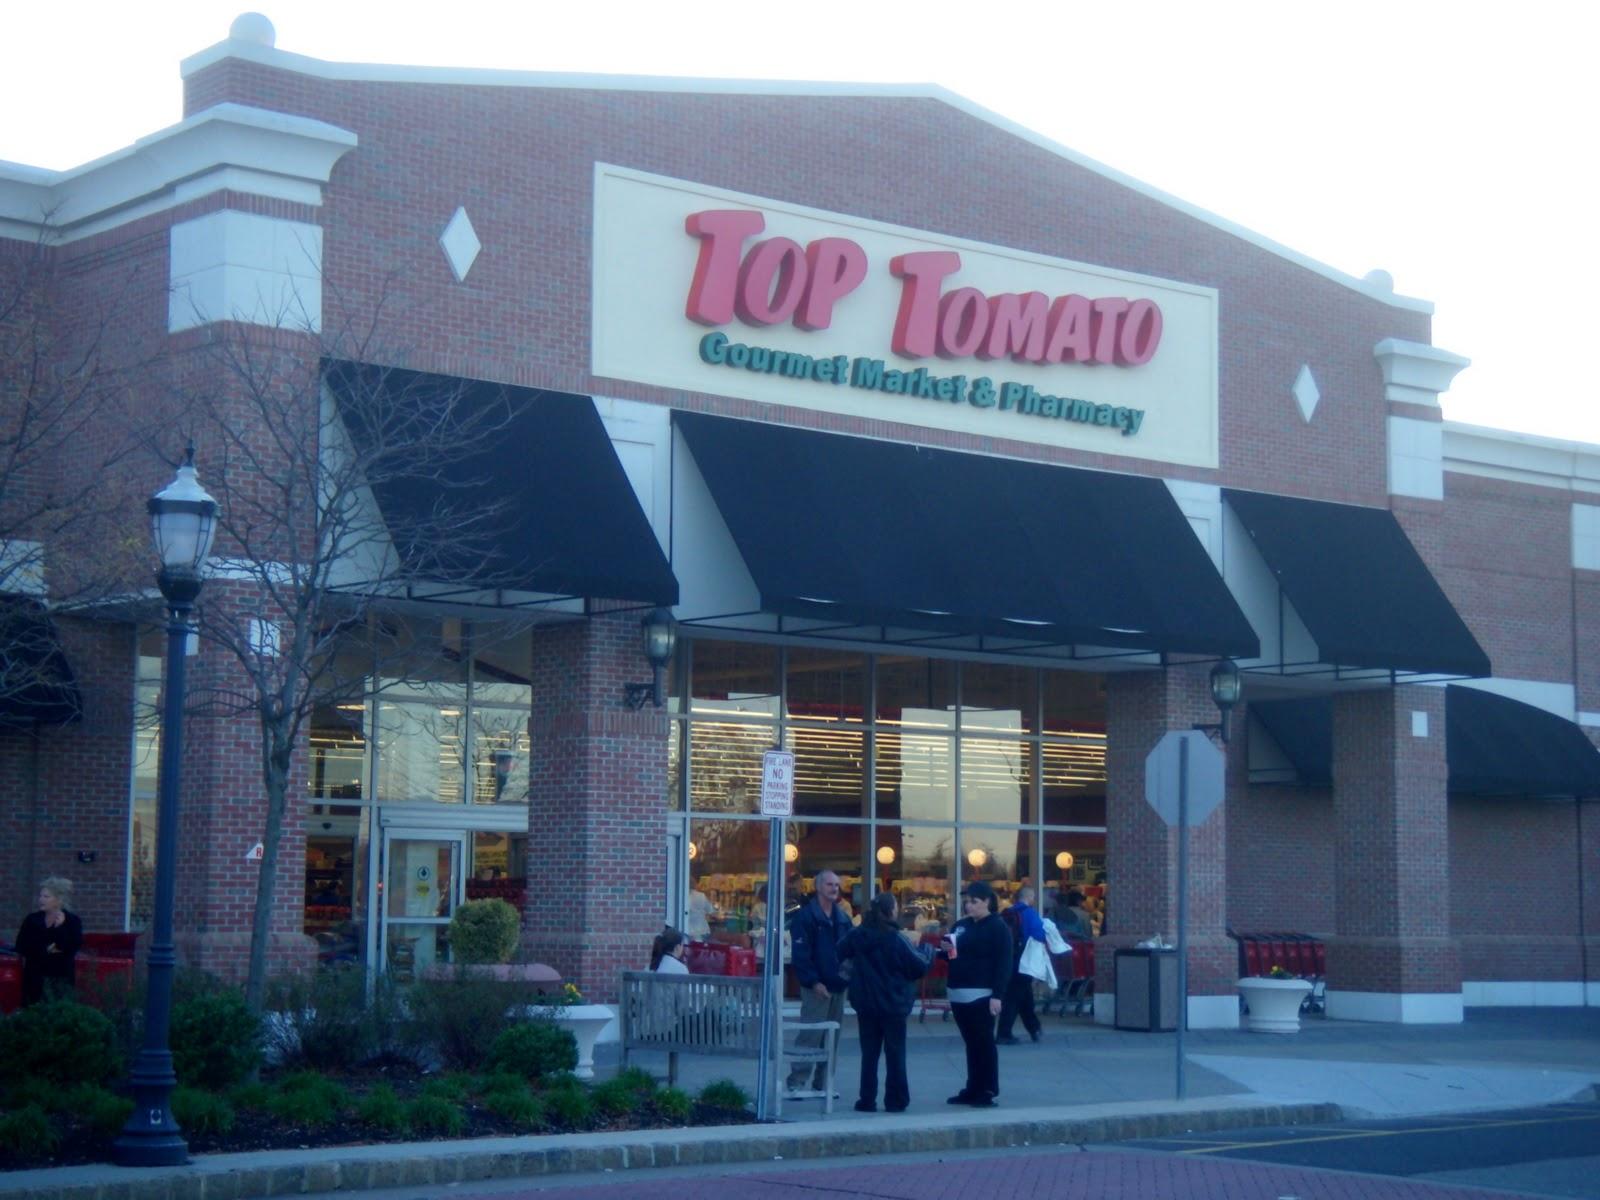 aberdeen nj life top tomato superstore open in holmdel top tomato superstore in holmdel opened on veterans day 2010